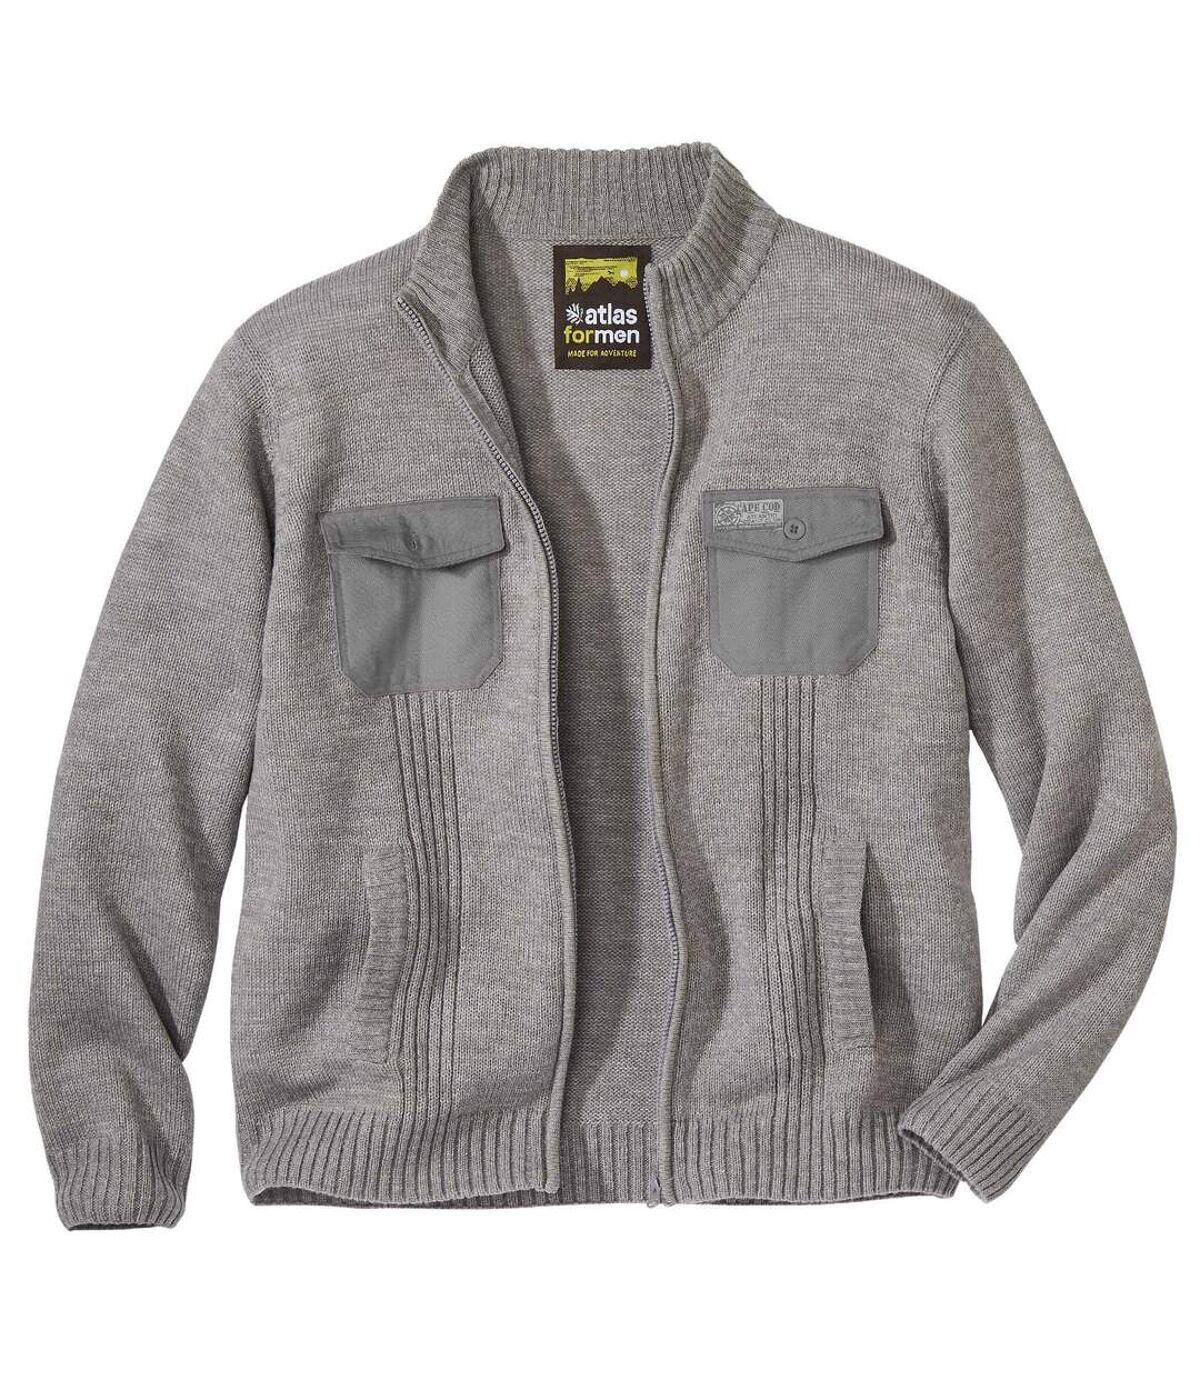 Úpletový sveter na zips Atlas Outdoor Atlas For Men